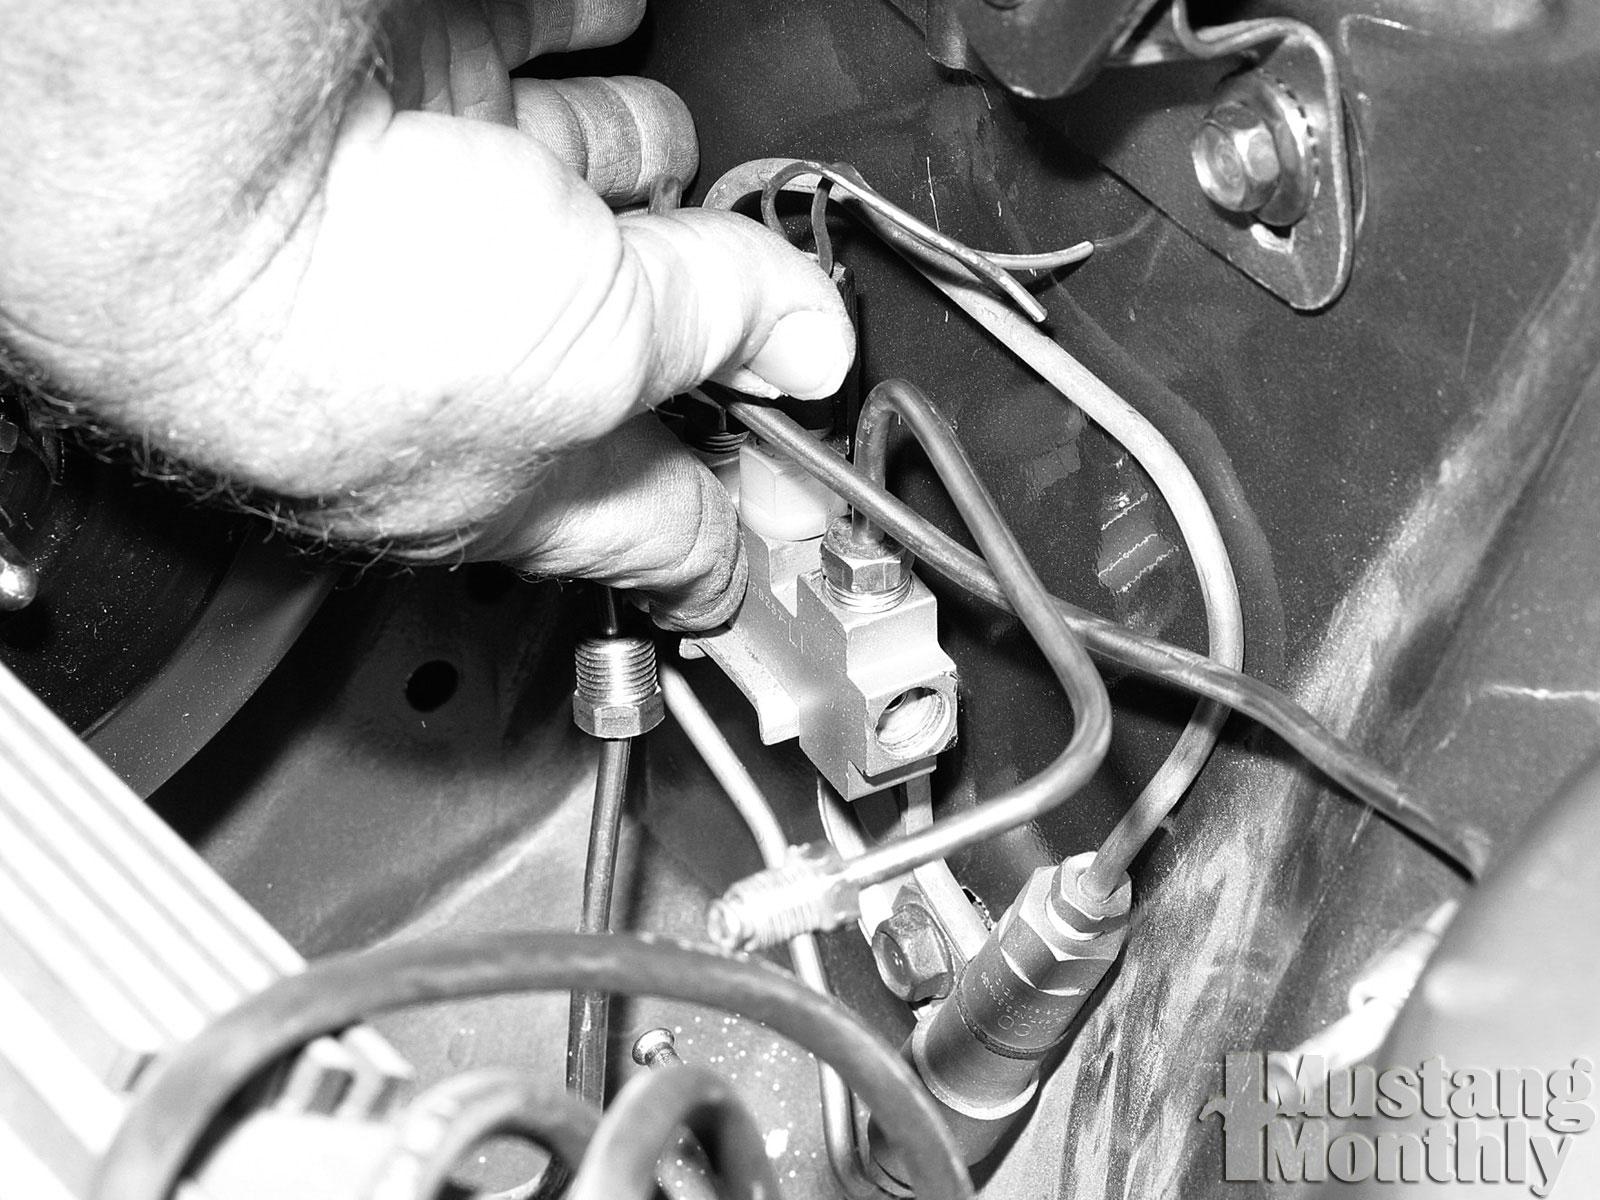 Mump 0308 16  Install Power Brake Booster  Reinstalled Distribution Block